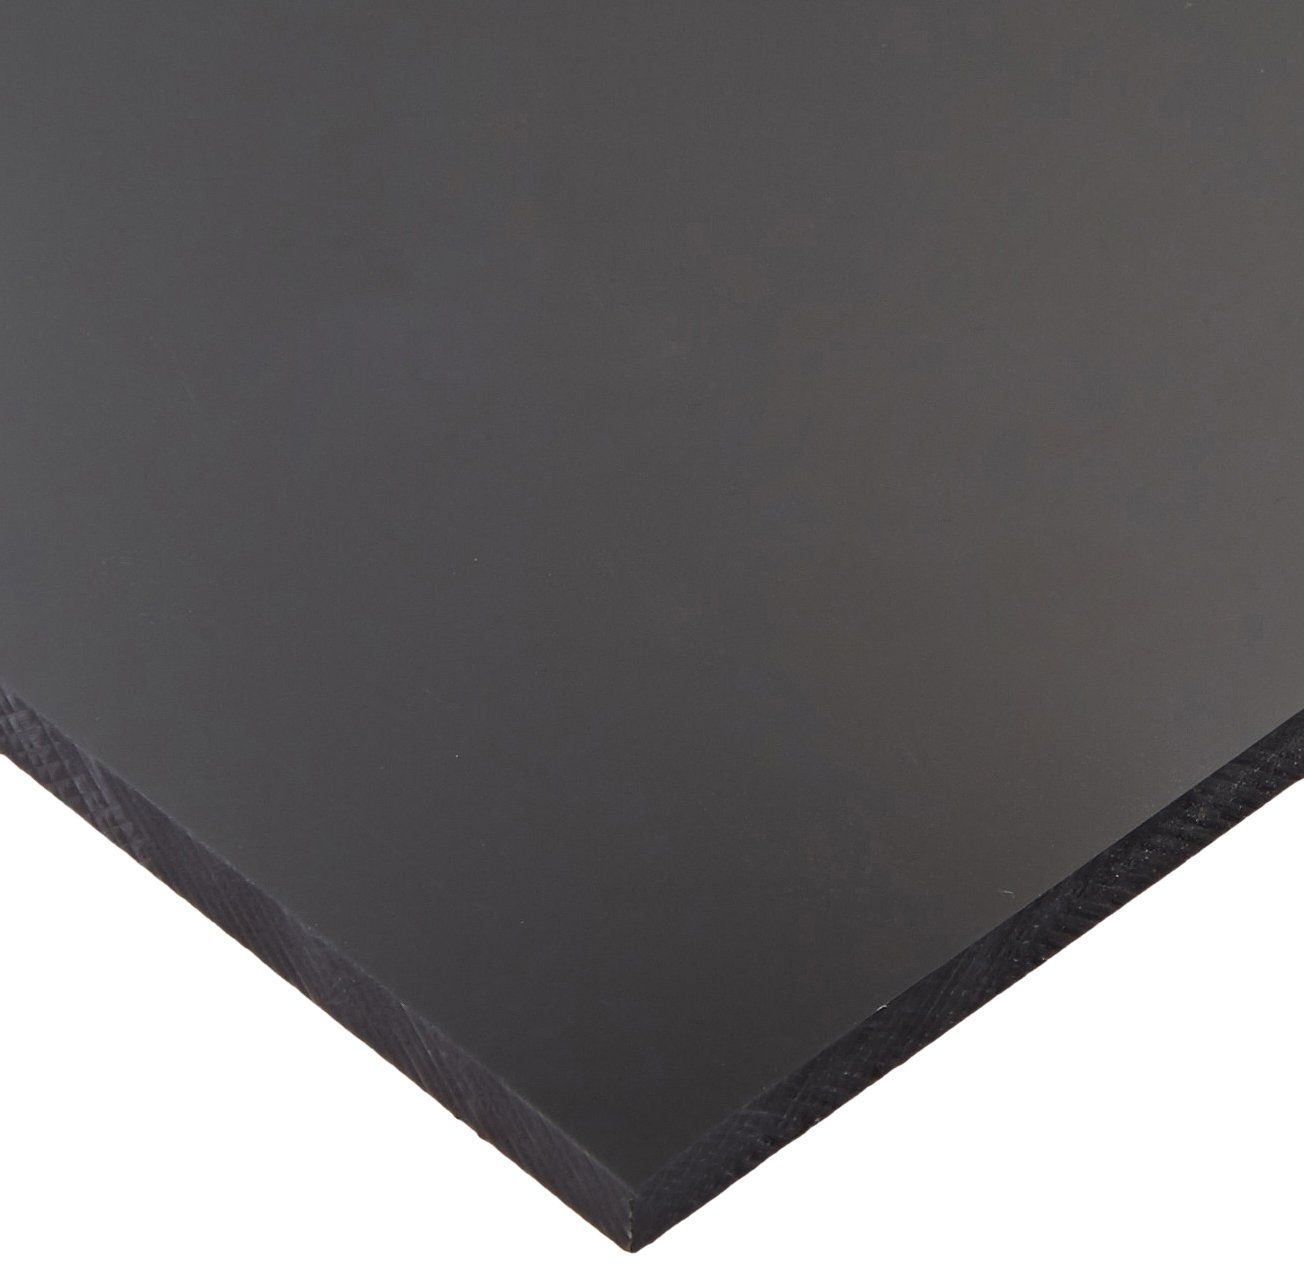 Cast Acrylic Sheet Translucent Black 12 X 24 X 0 118 Size Ad Sheet Ad Translucent Cast Acrylic Cast Acrylic Sheet Cast Acrylic Acrylic Sheets